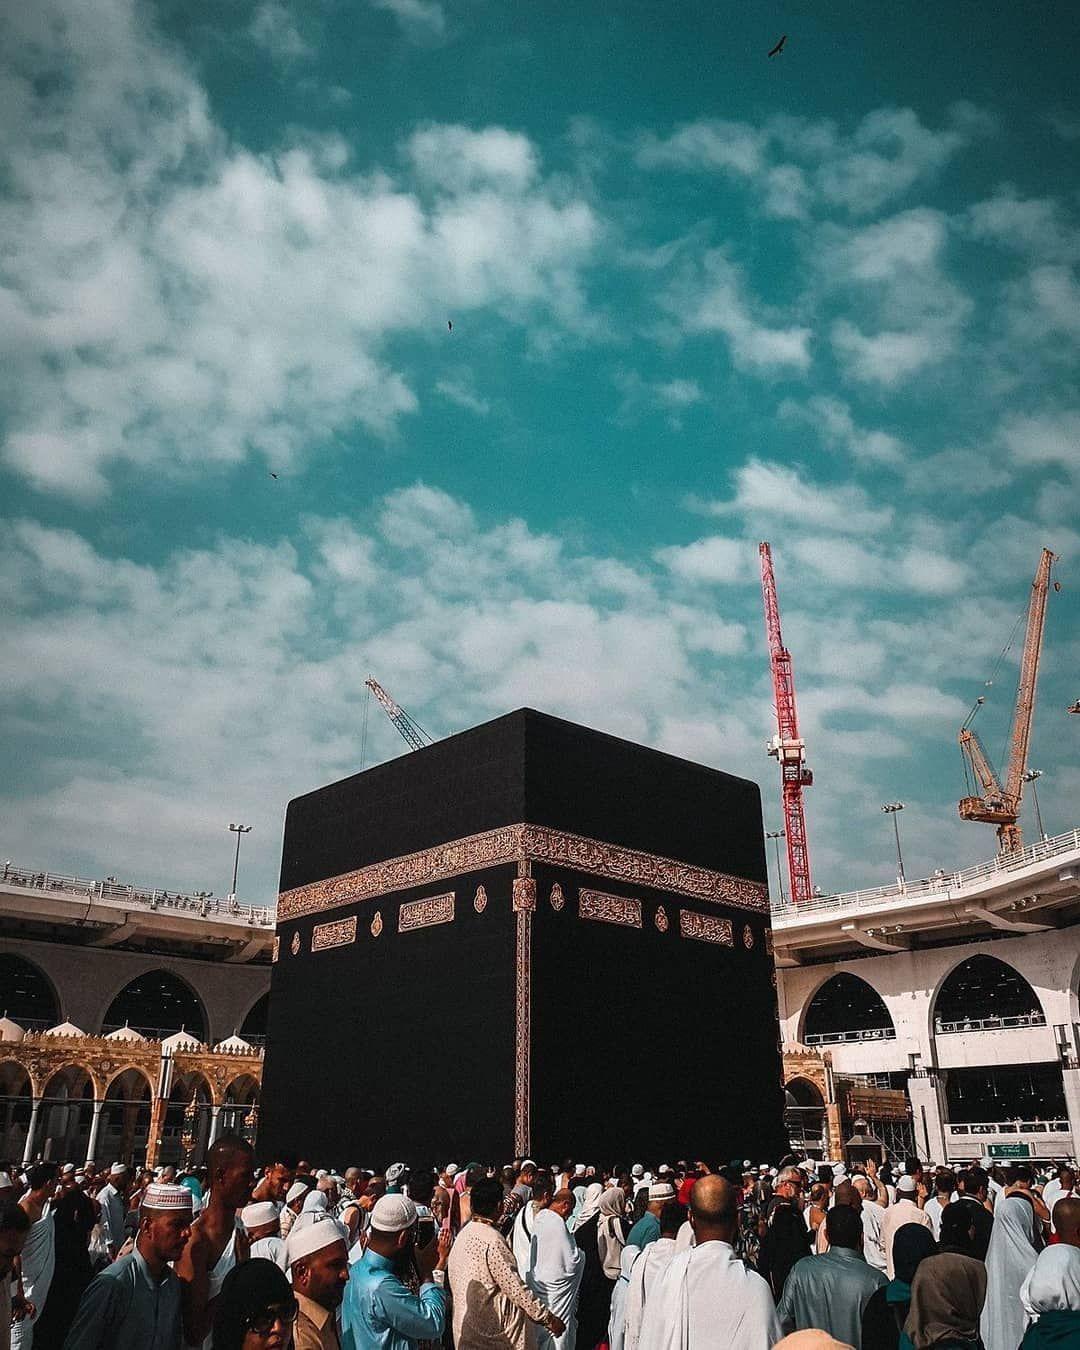 10 1k Likes 102 Comments Makkah Madinah مكة مدينة Makkah Madinah On Instagram The Thing About ʾiman Is Gambar Kota Pemandangan Arsitektur Islamis